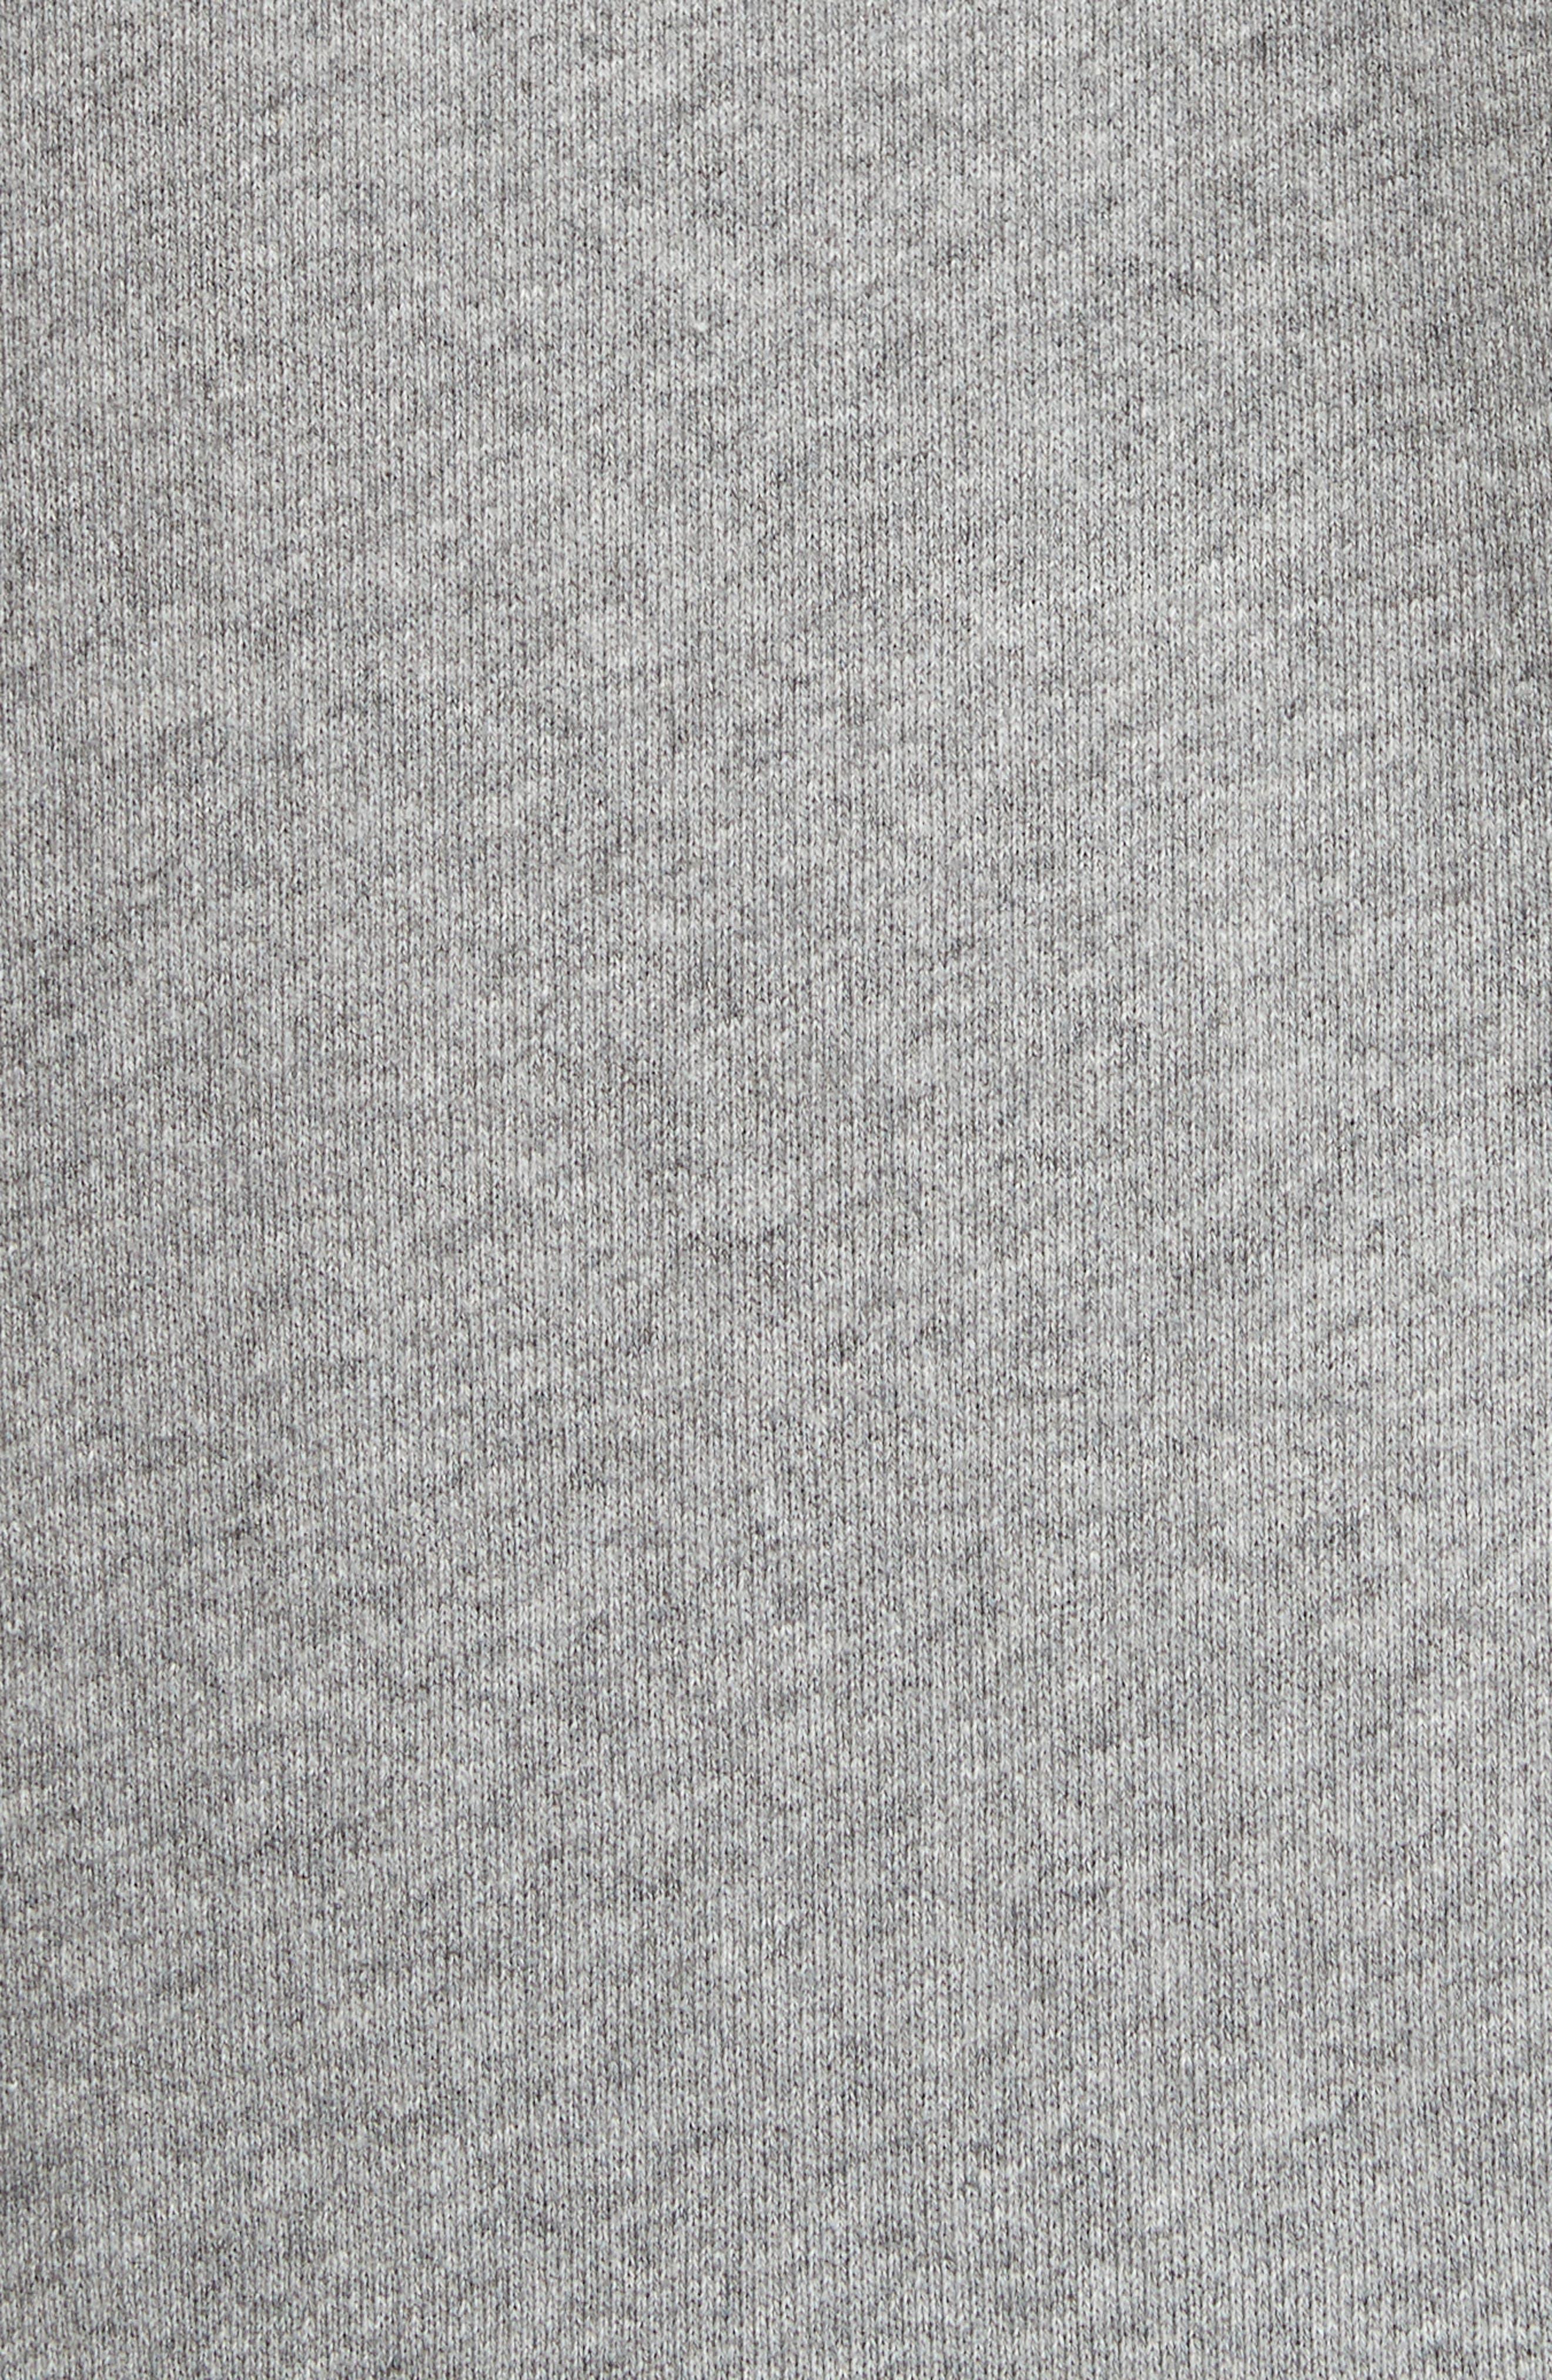 Short Sleeve Sweatshirt,                             Alternate thumbnail 5, color,